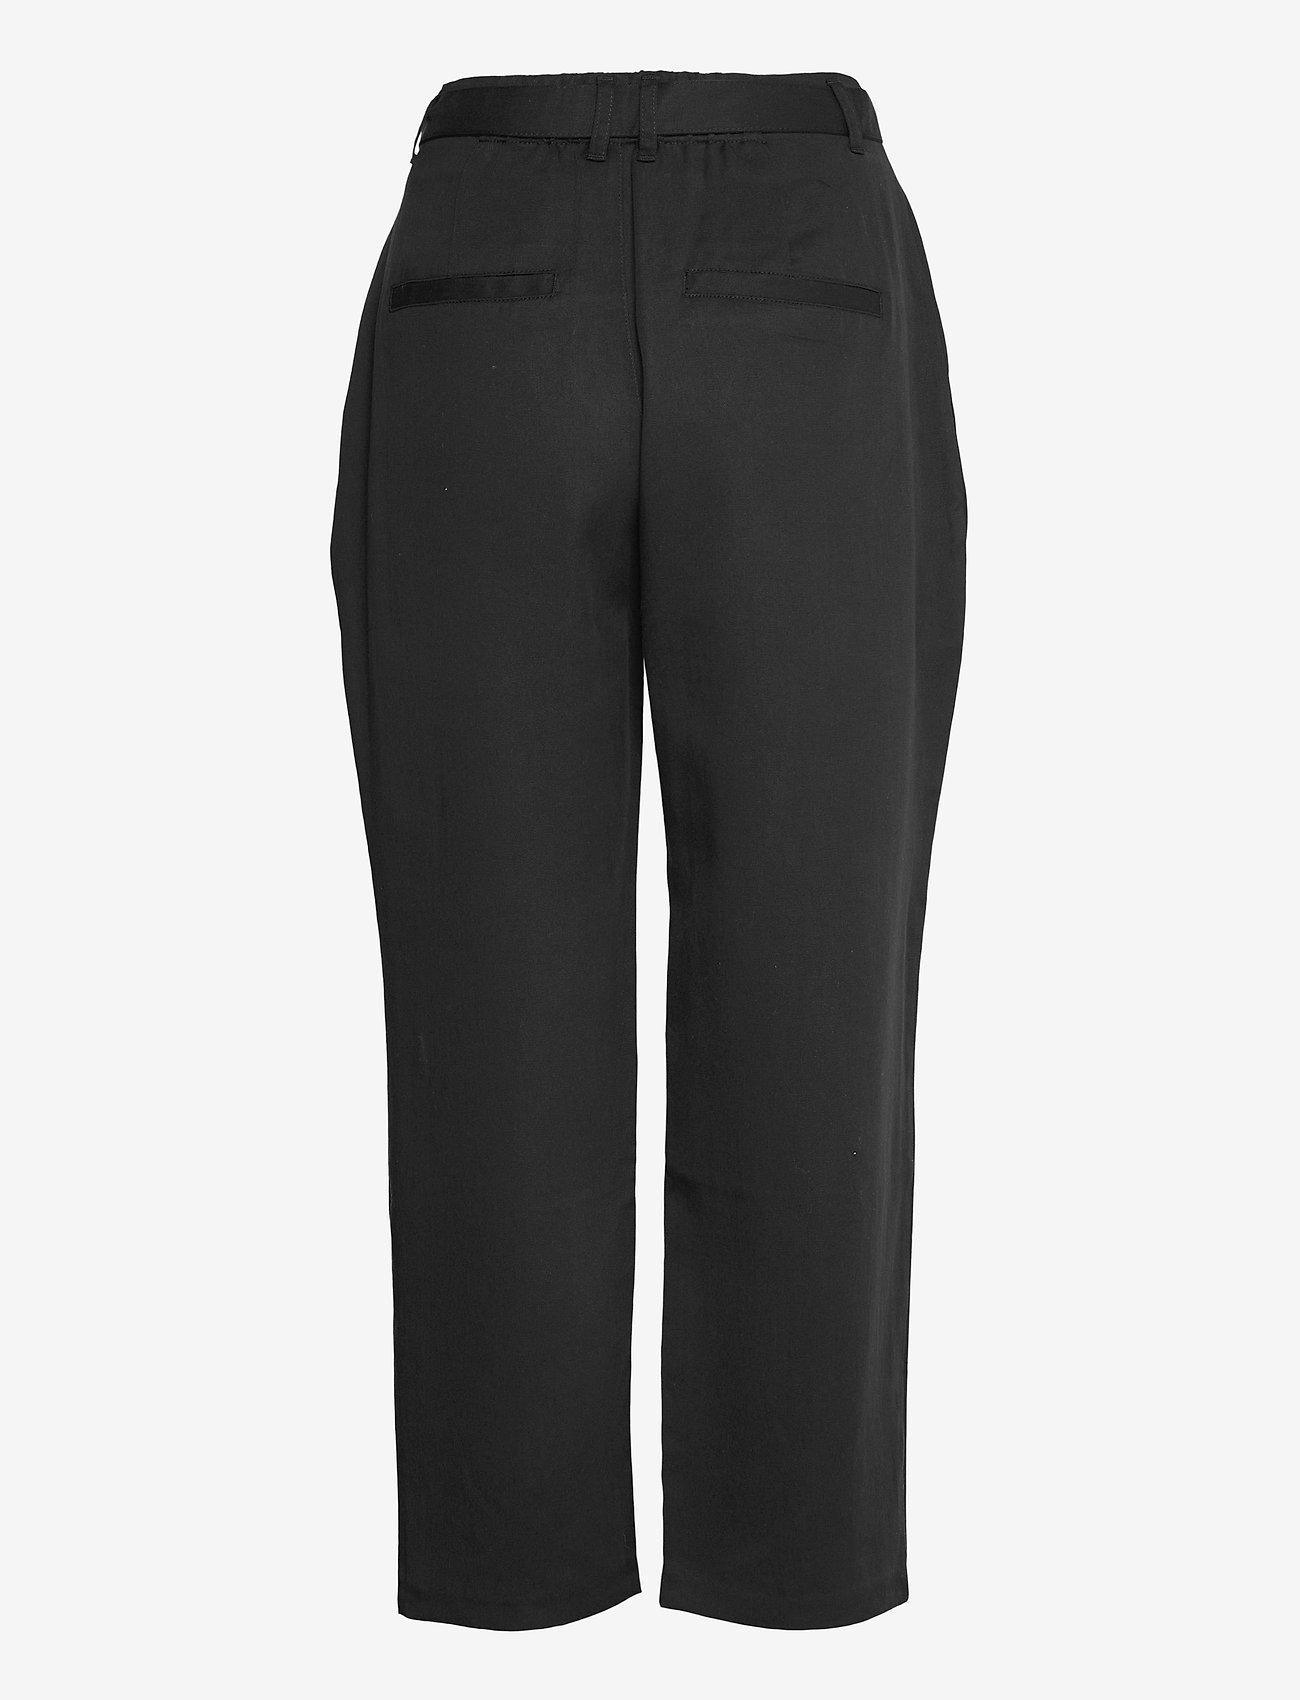 Abercrombie & Fitch - ANF WOMENS PANTS - bukser med lige ben - black - 1